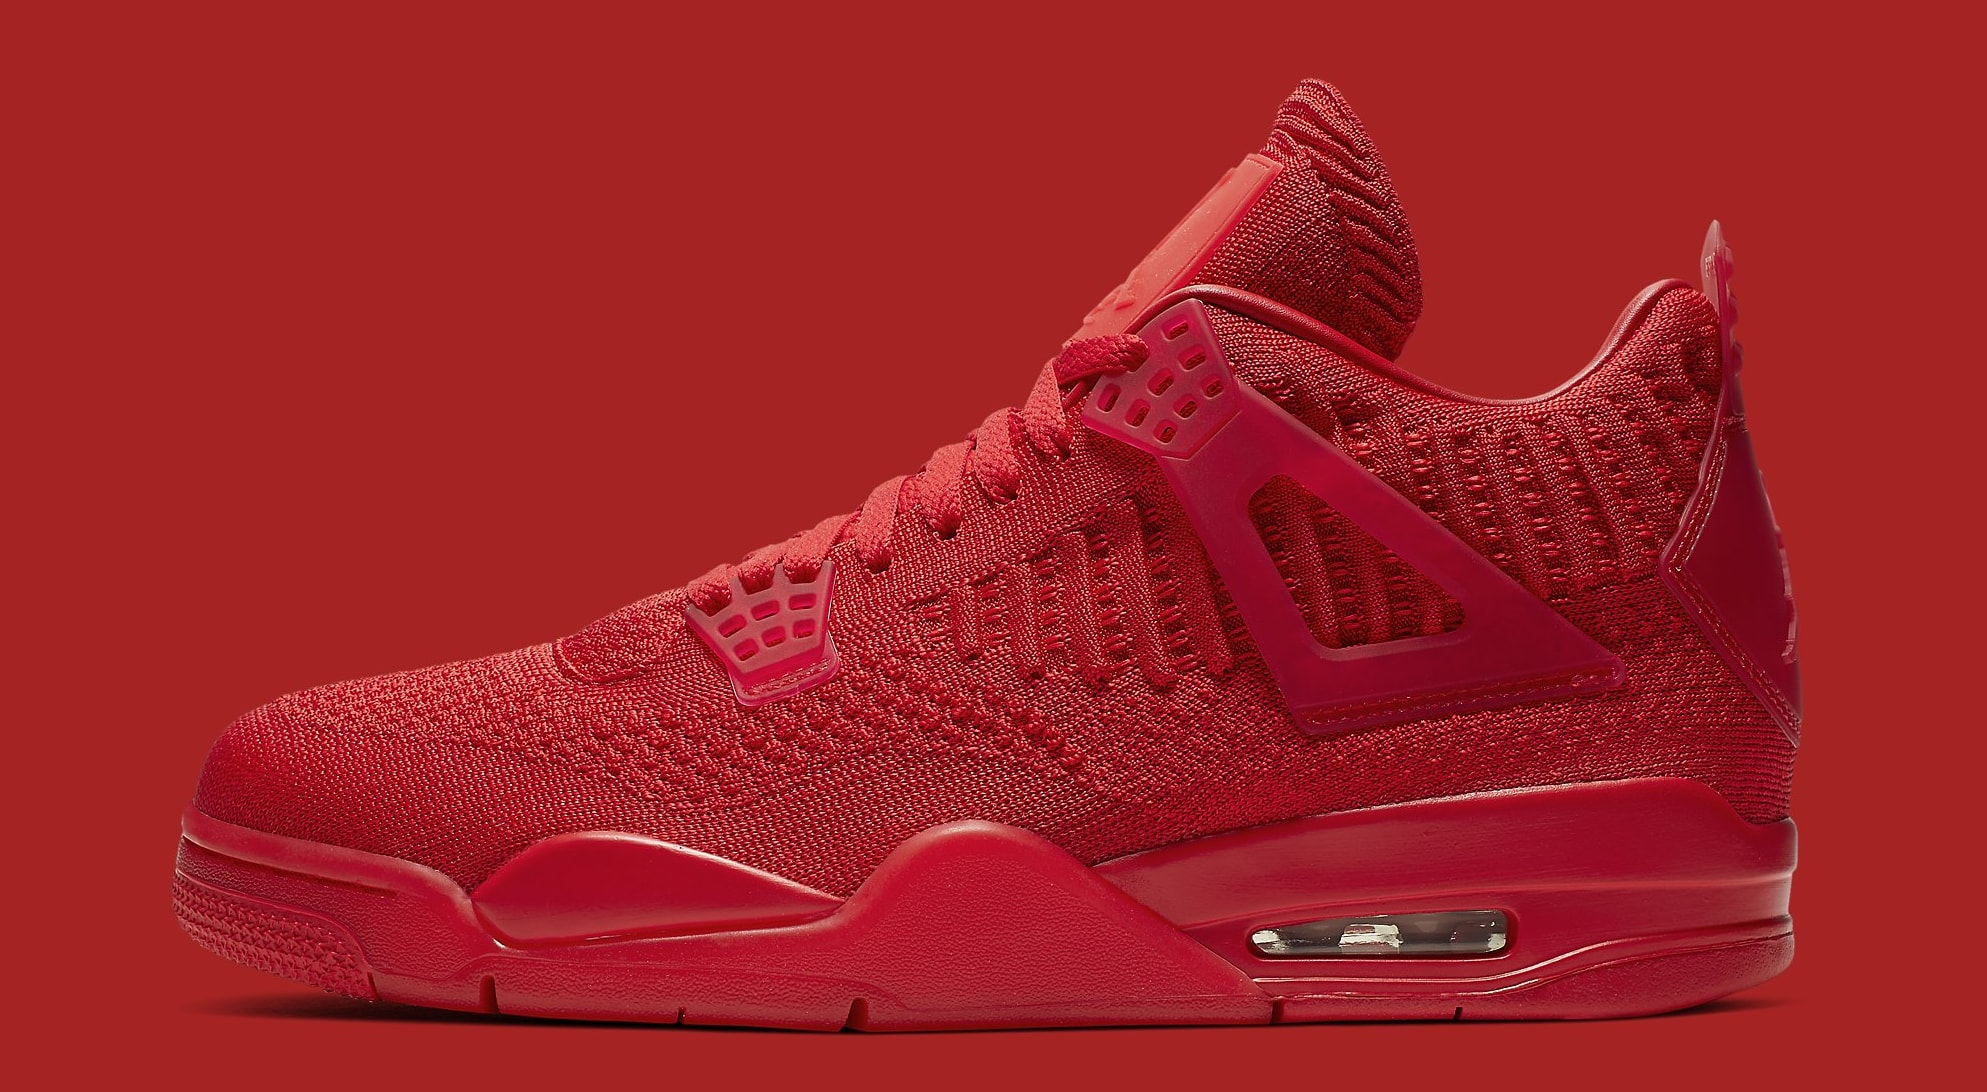 sports shoes 47ba6 5b907 Air Jordan 4 Flyknit Release Date 06/14/2019 | Sole Collector